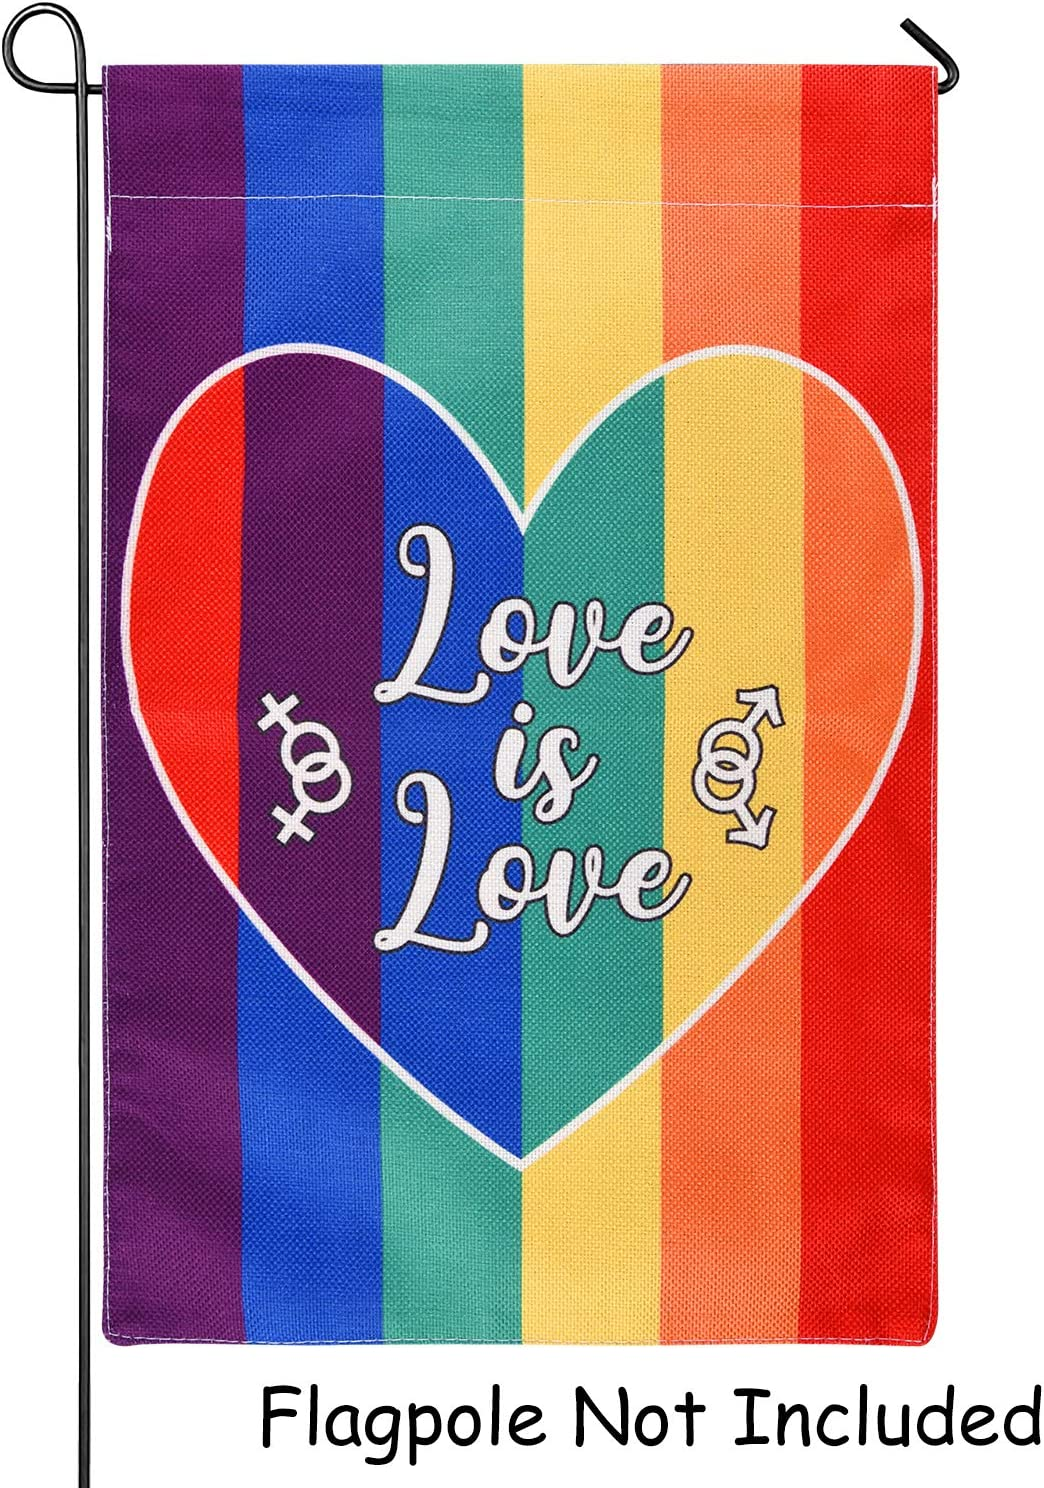 FEPITO Pride Garden Flag Love is Love Rainbow Garden Flag, Double Sided Burlap Garden Flag for LGBT Gay Pride House Yard Outdoor Decoration 12 Inch x18 Inch